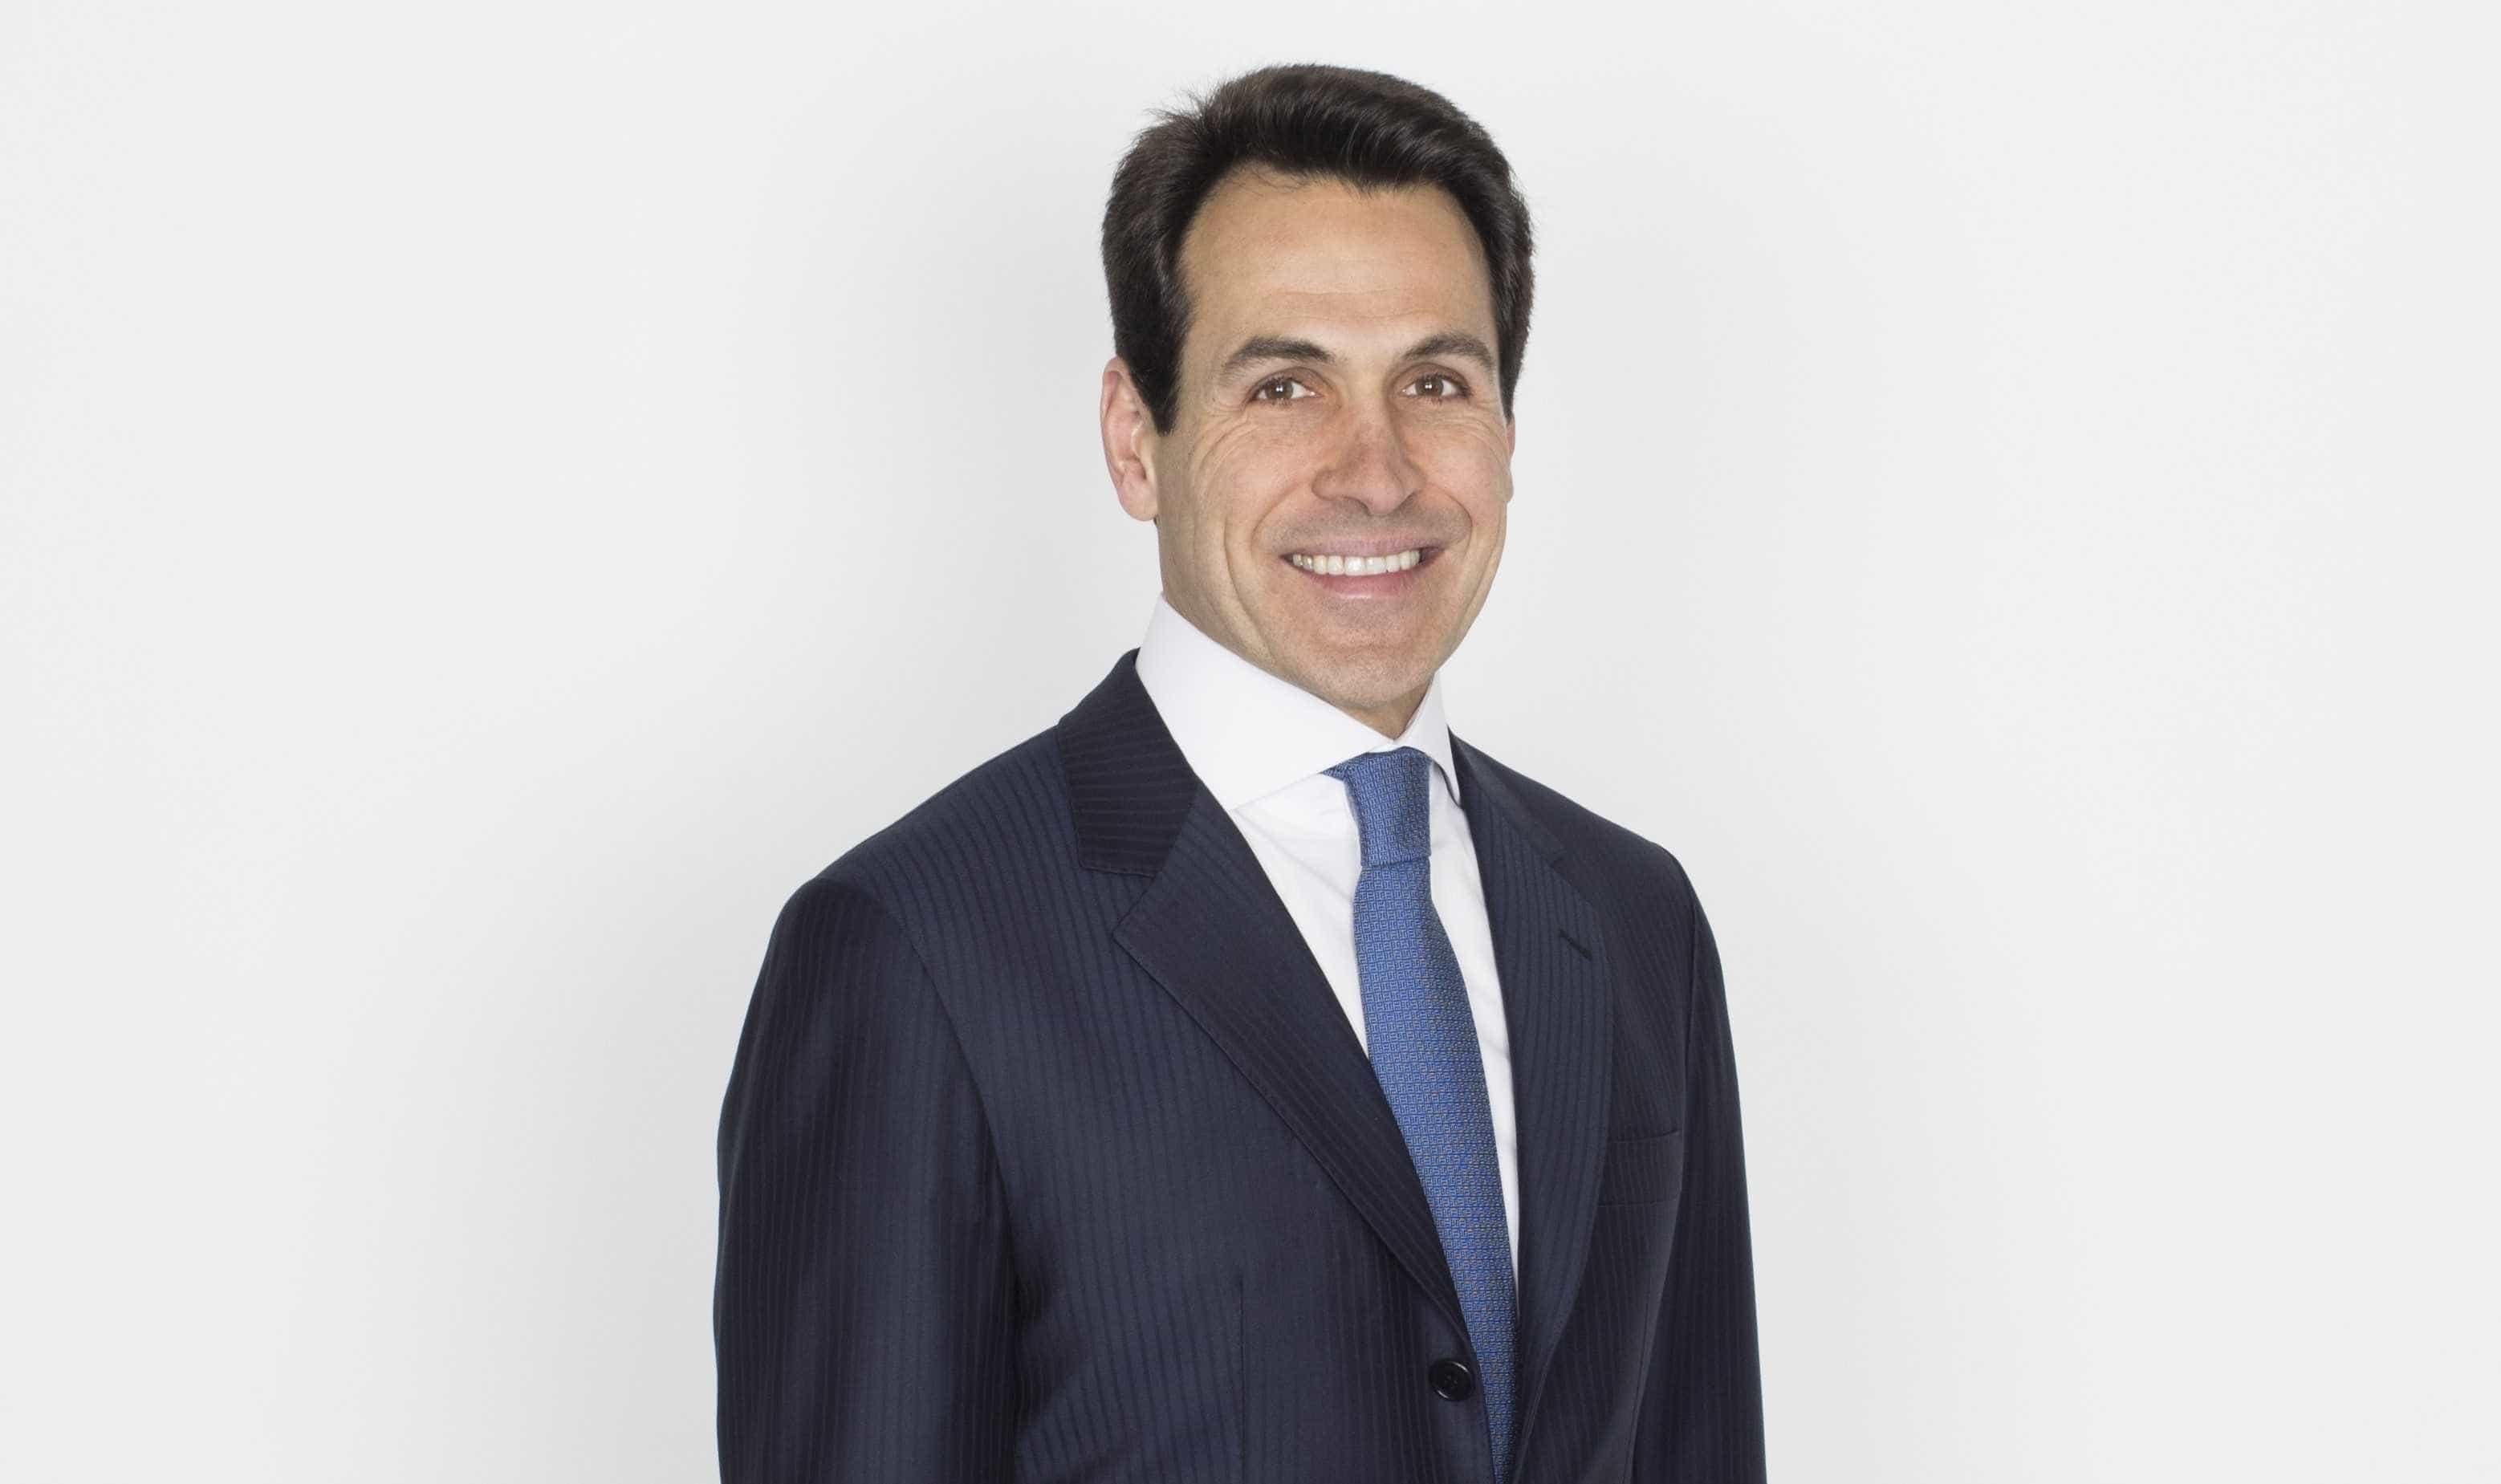 Moro condena empresário a 10 anos e 4 meses por propina na Petrobras